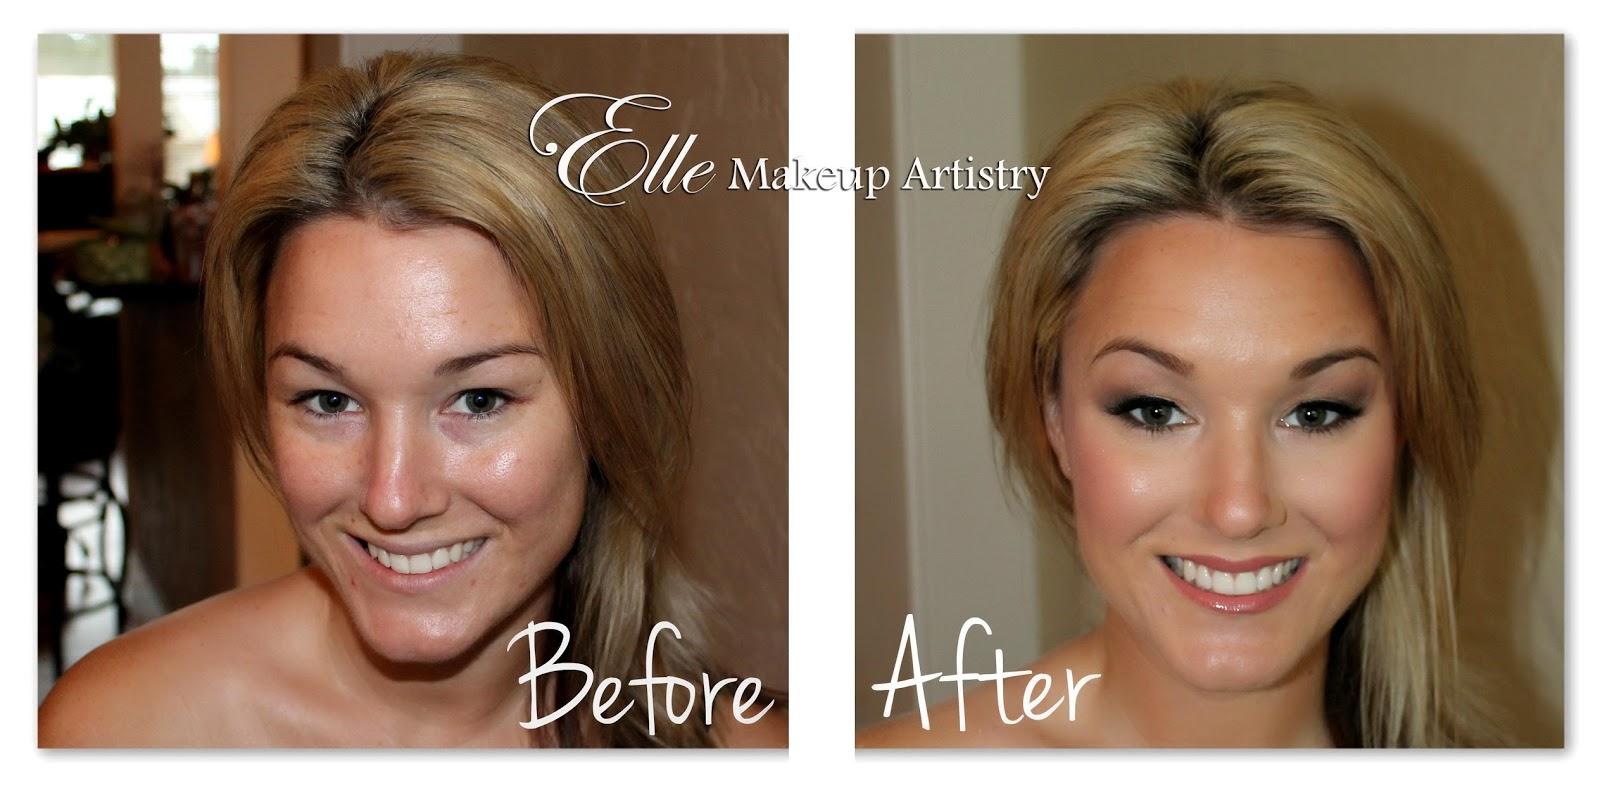 Wedding Eye Makeup Hooded Eyes : Elle Makeup Artist: Before and After - Beautiful Bridal ...